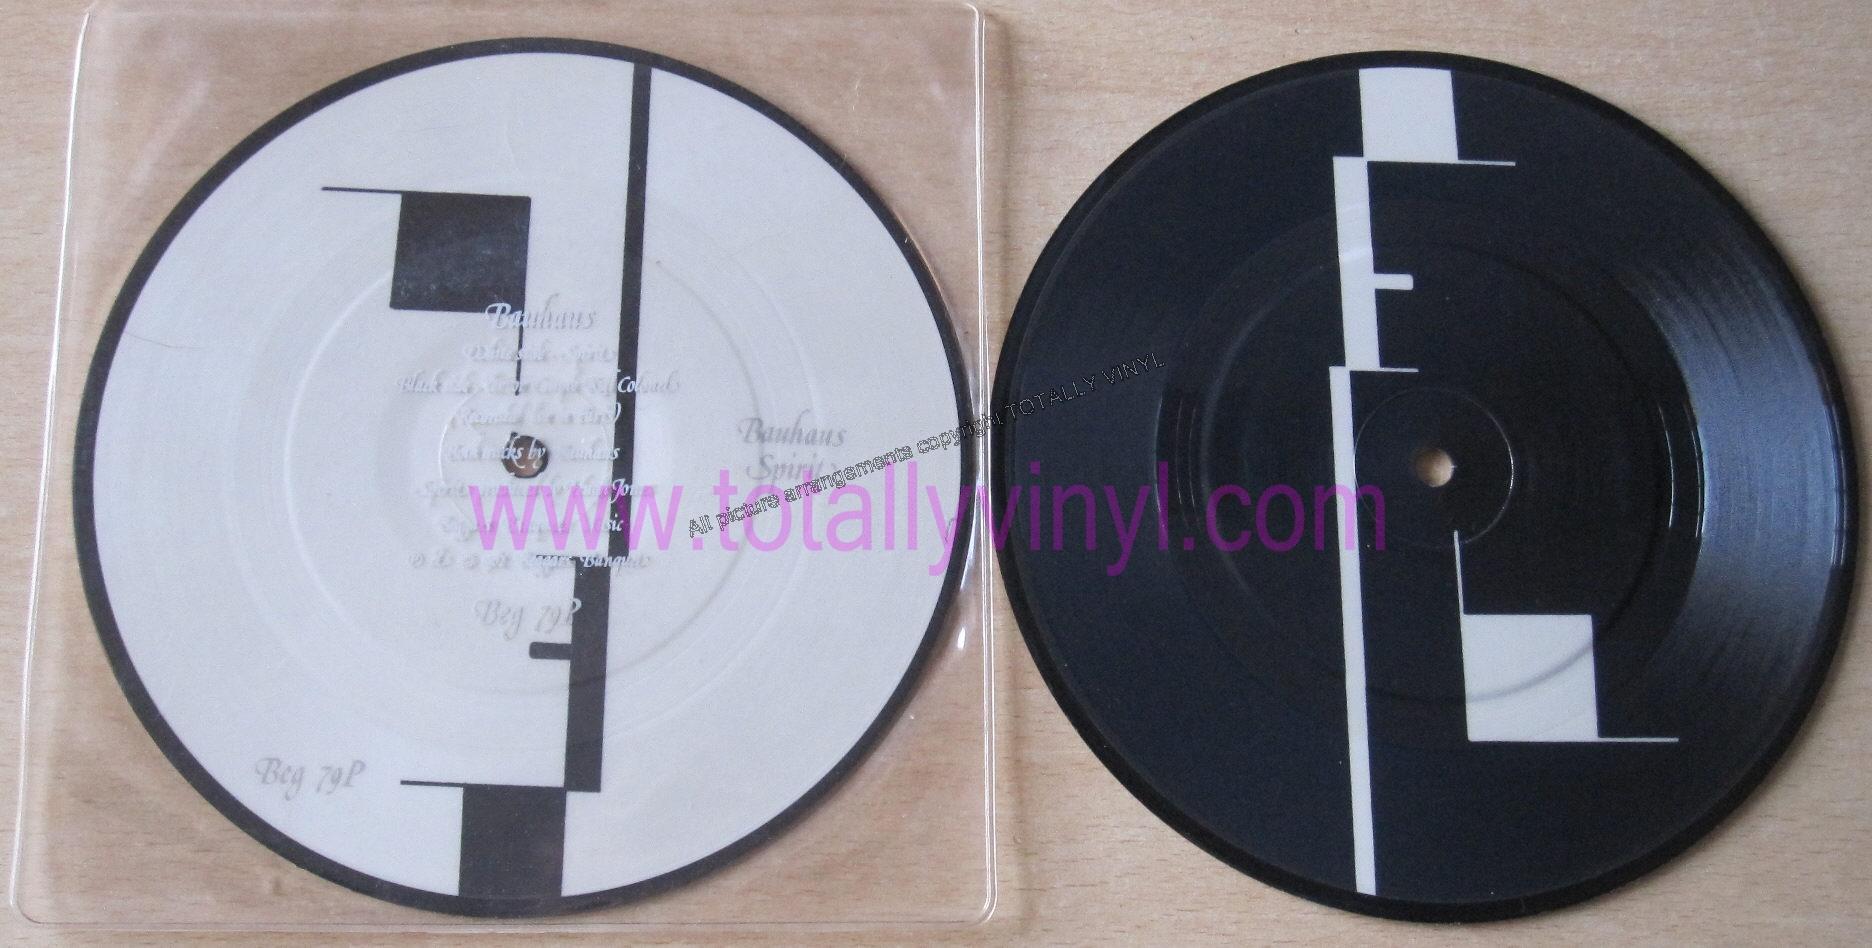 totally vinyl records bauhaus spirit 7 inch picture. Black Bedroom Furniture Sets. Home Design Ideas